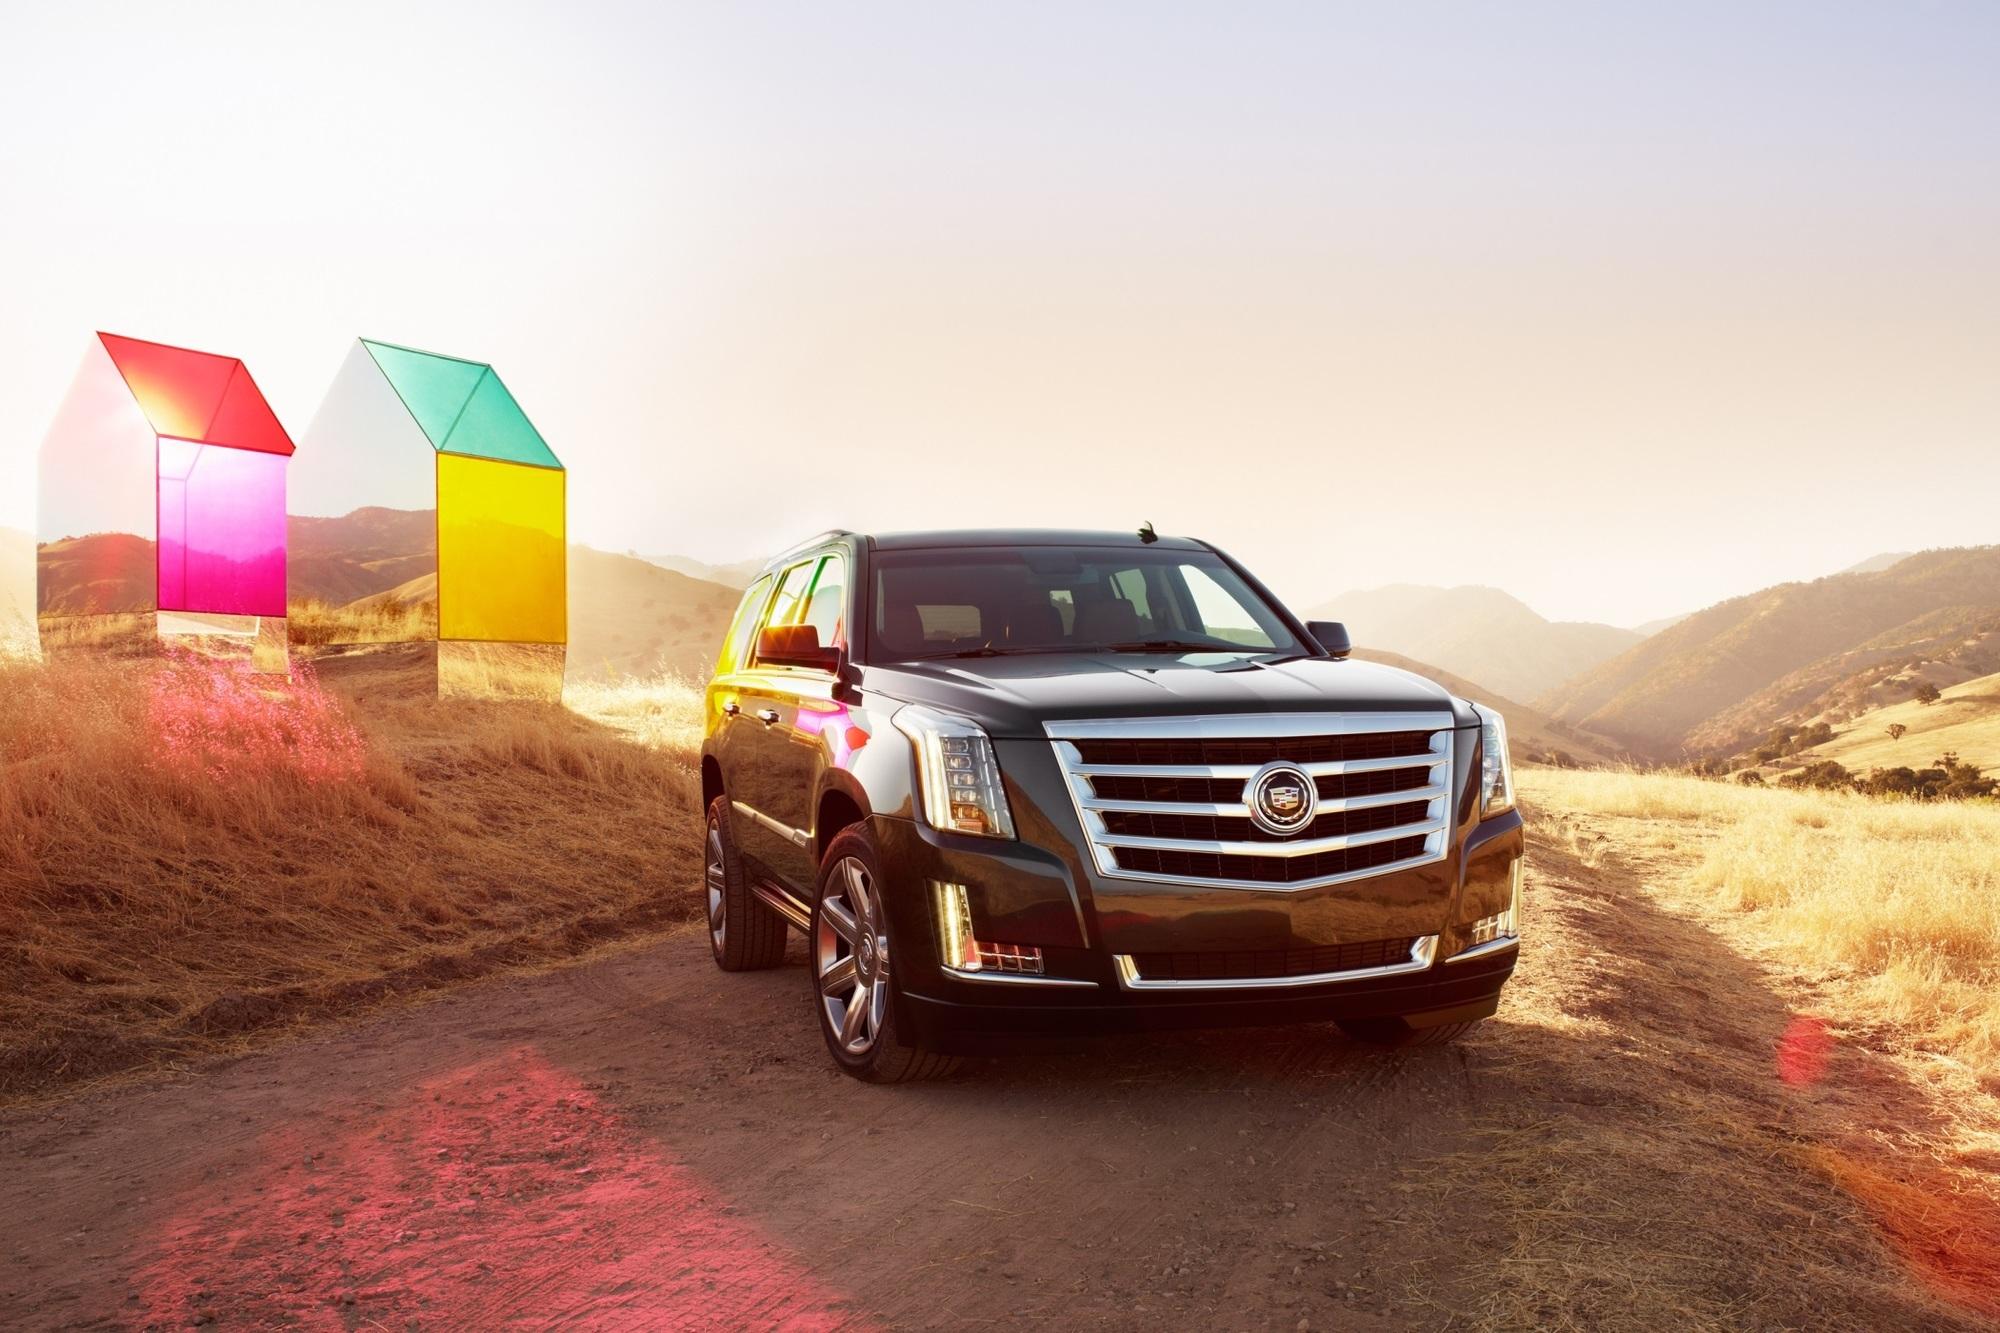 Fahrbericht: Cadillac Escalade - Ist der dick, Mann!